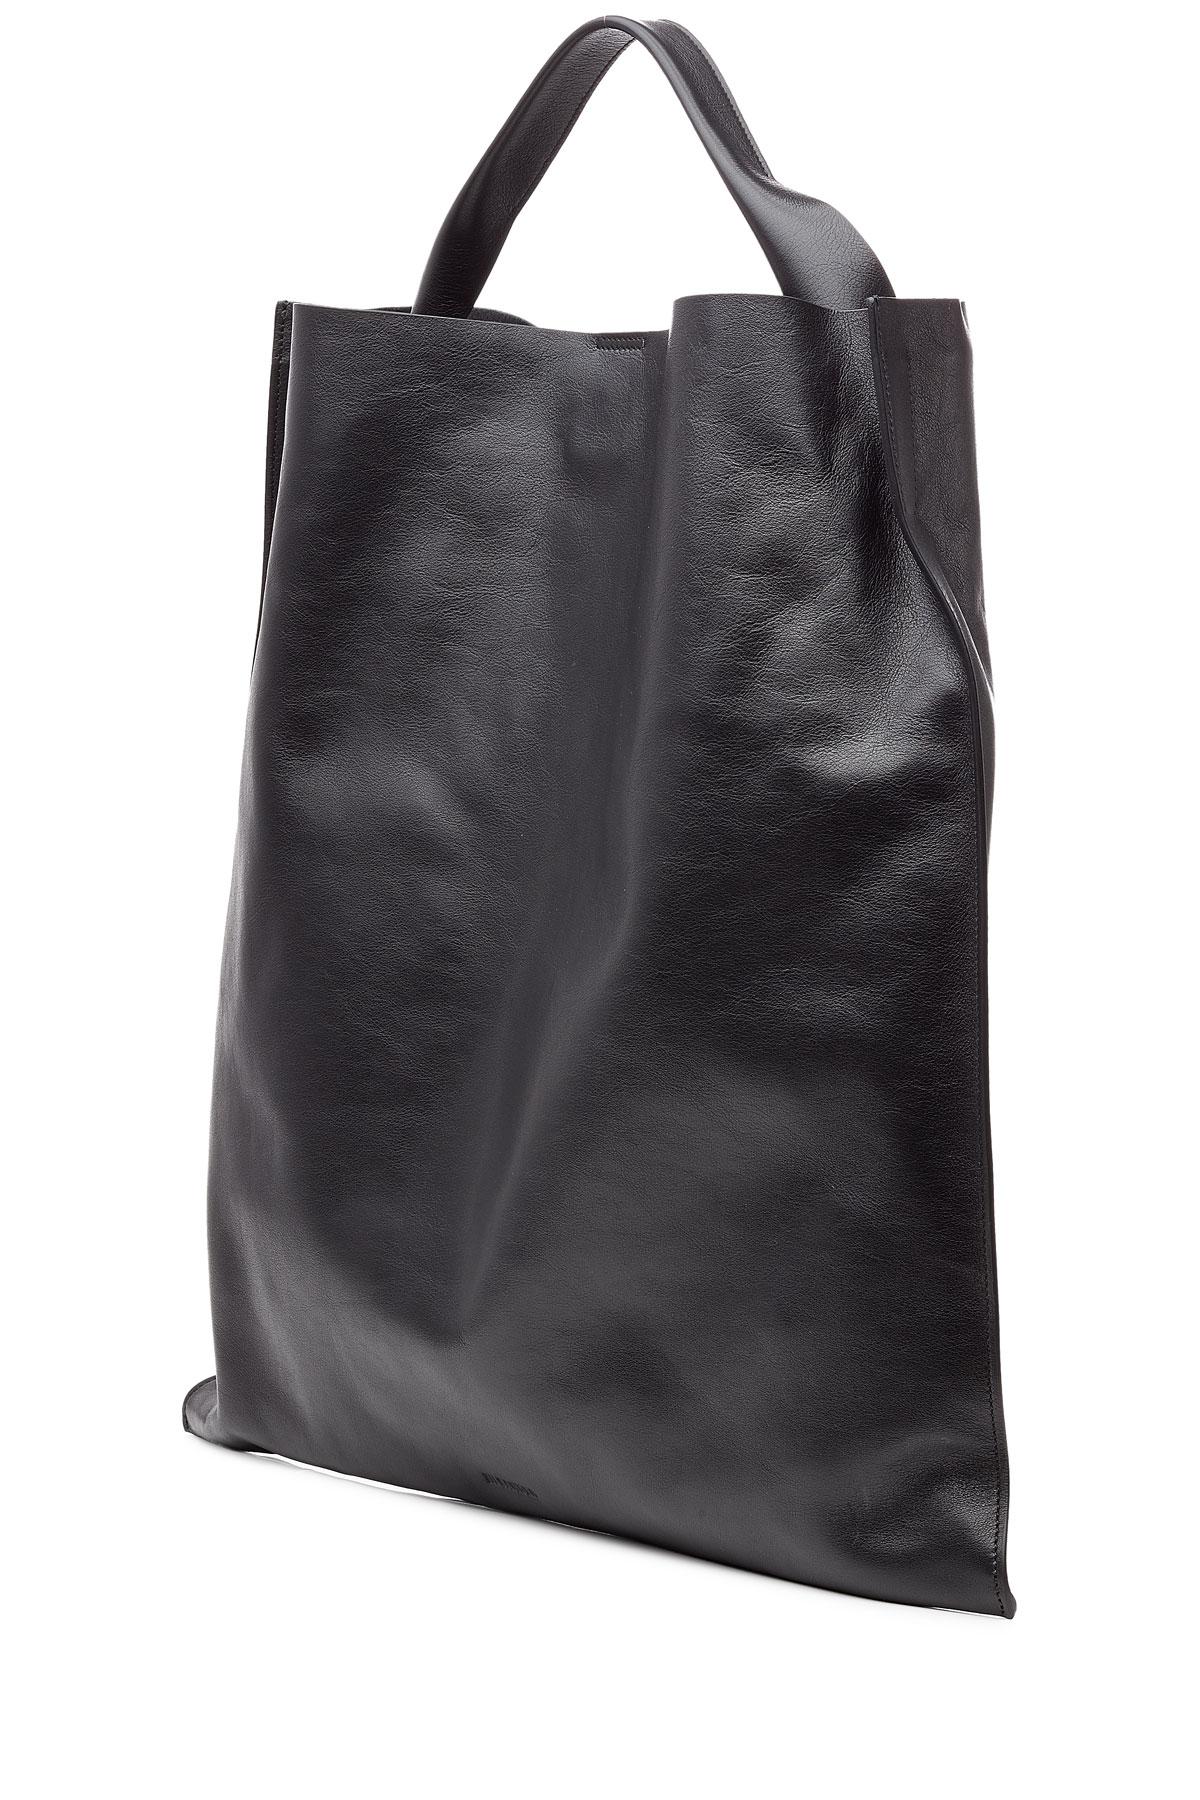 9291ea234bac Lyst - Jil Sander Xiao Leather Tote in Black